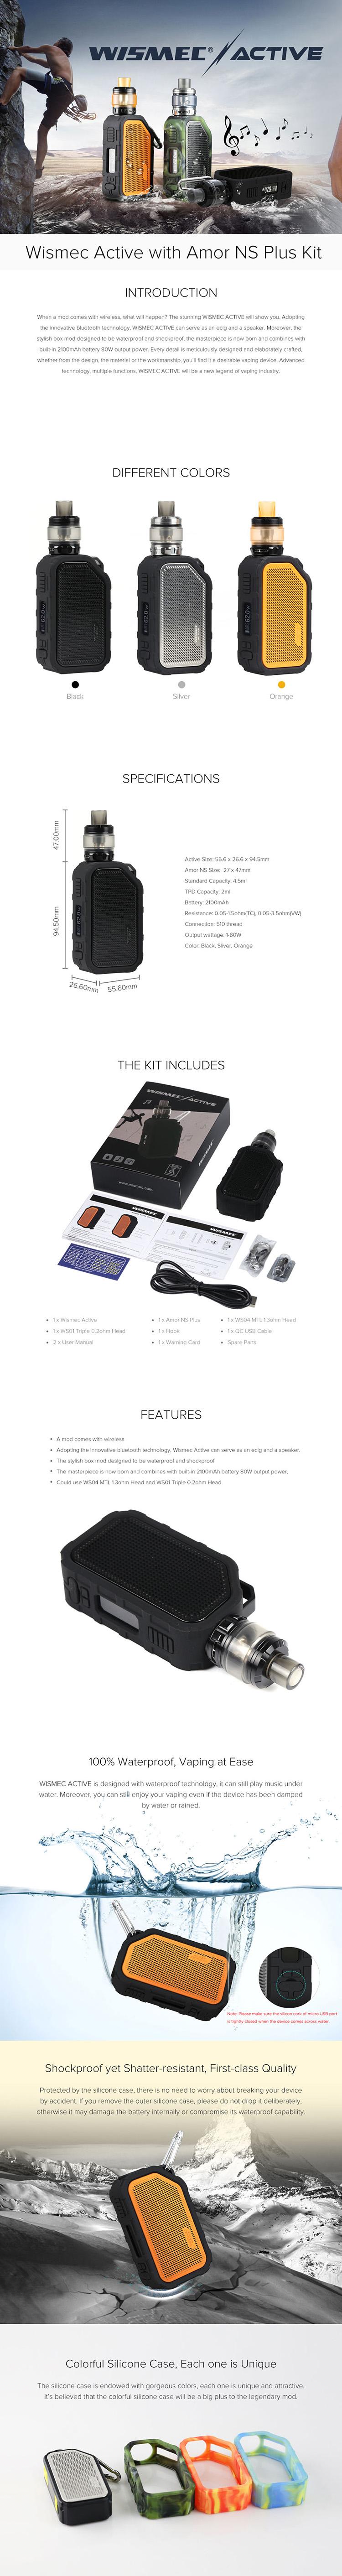 Wismec Active Bluetooth Music Kit 2100mAh